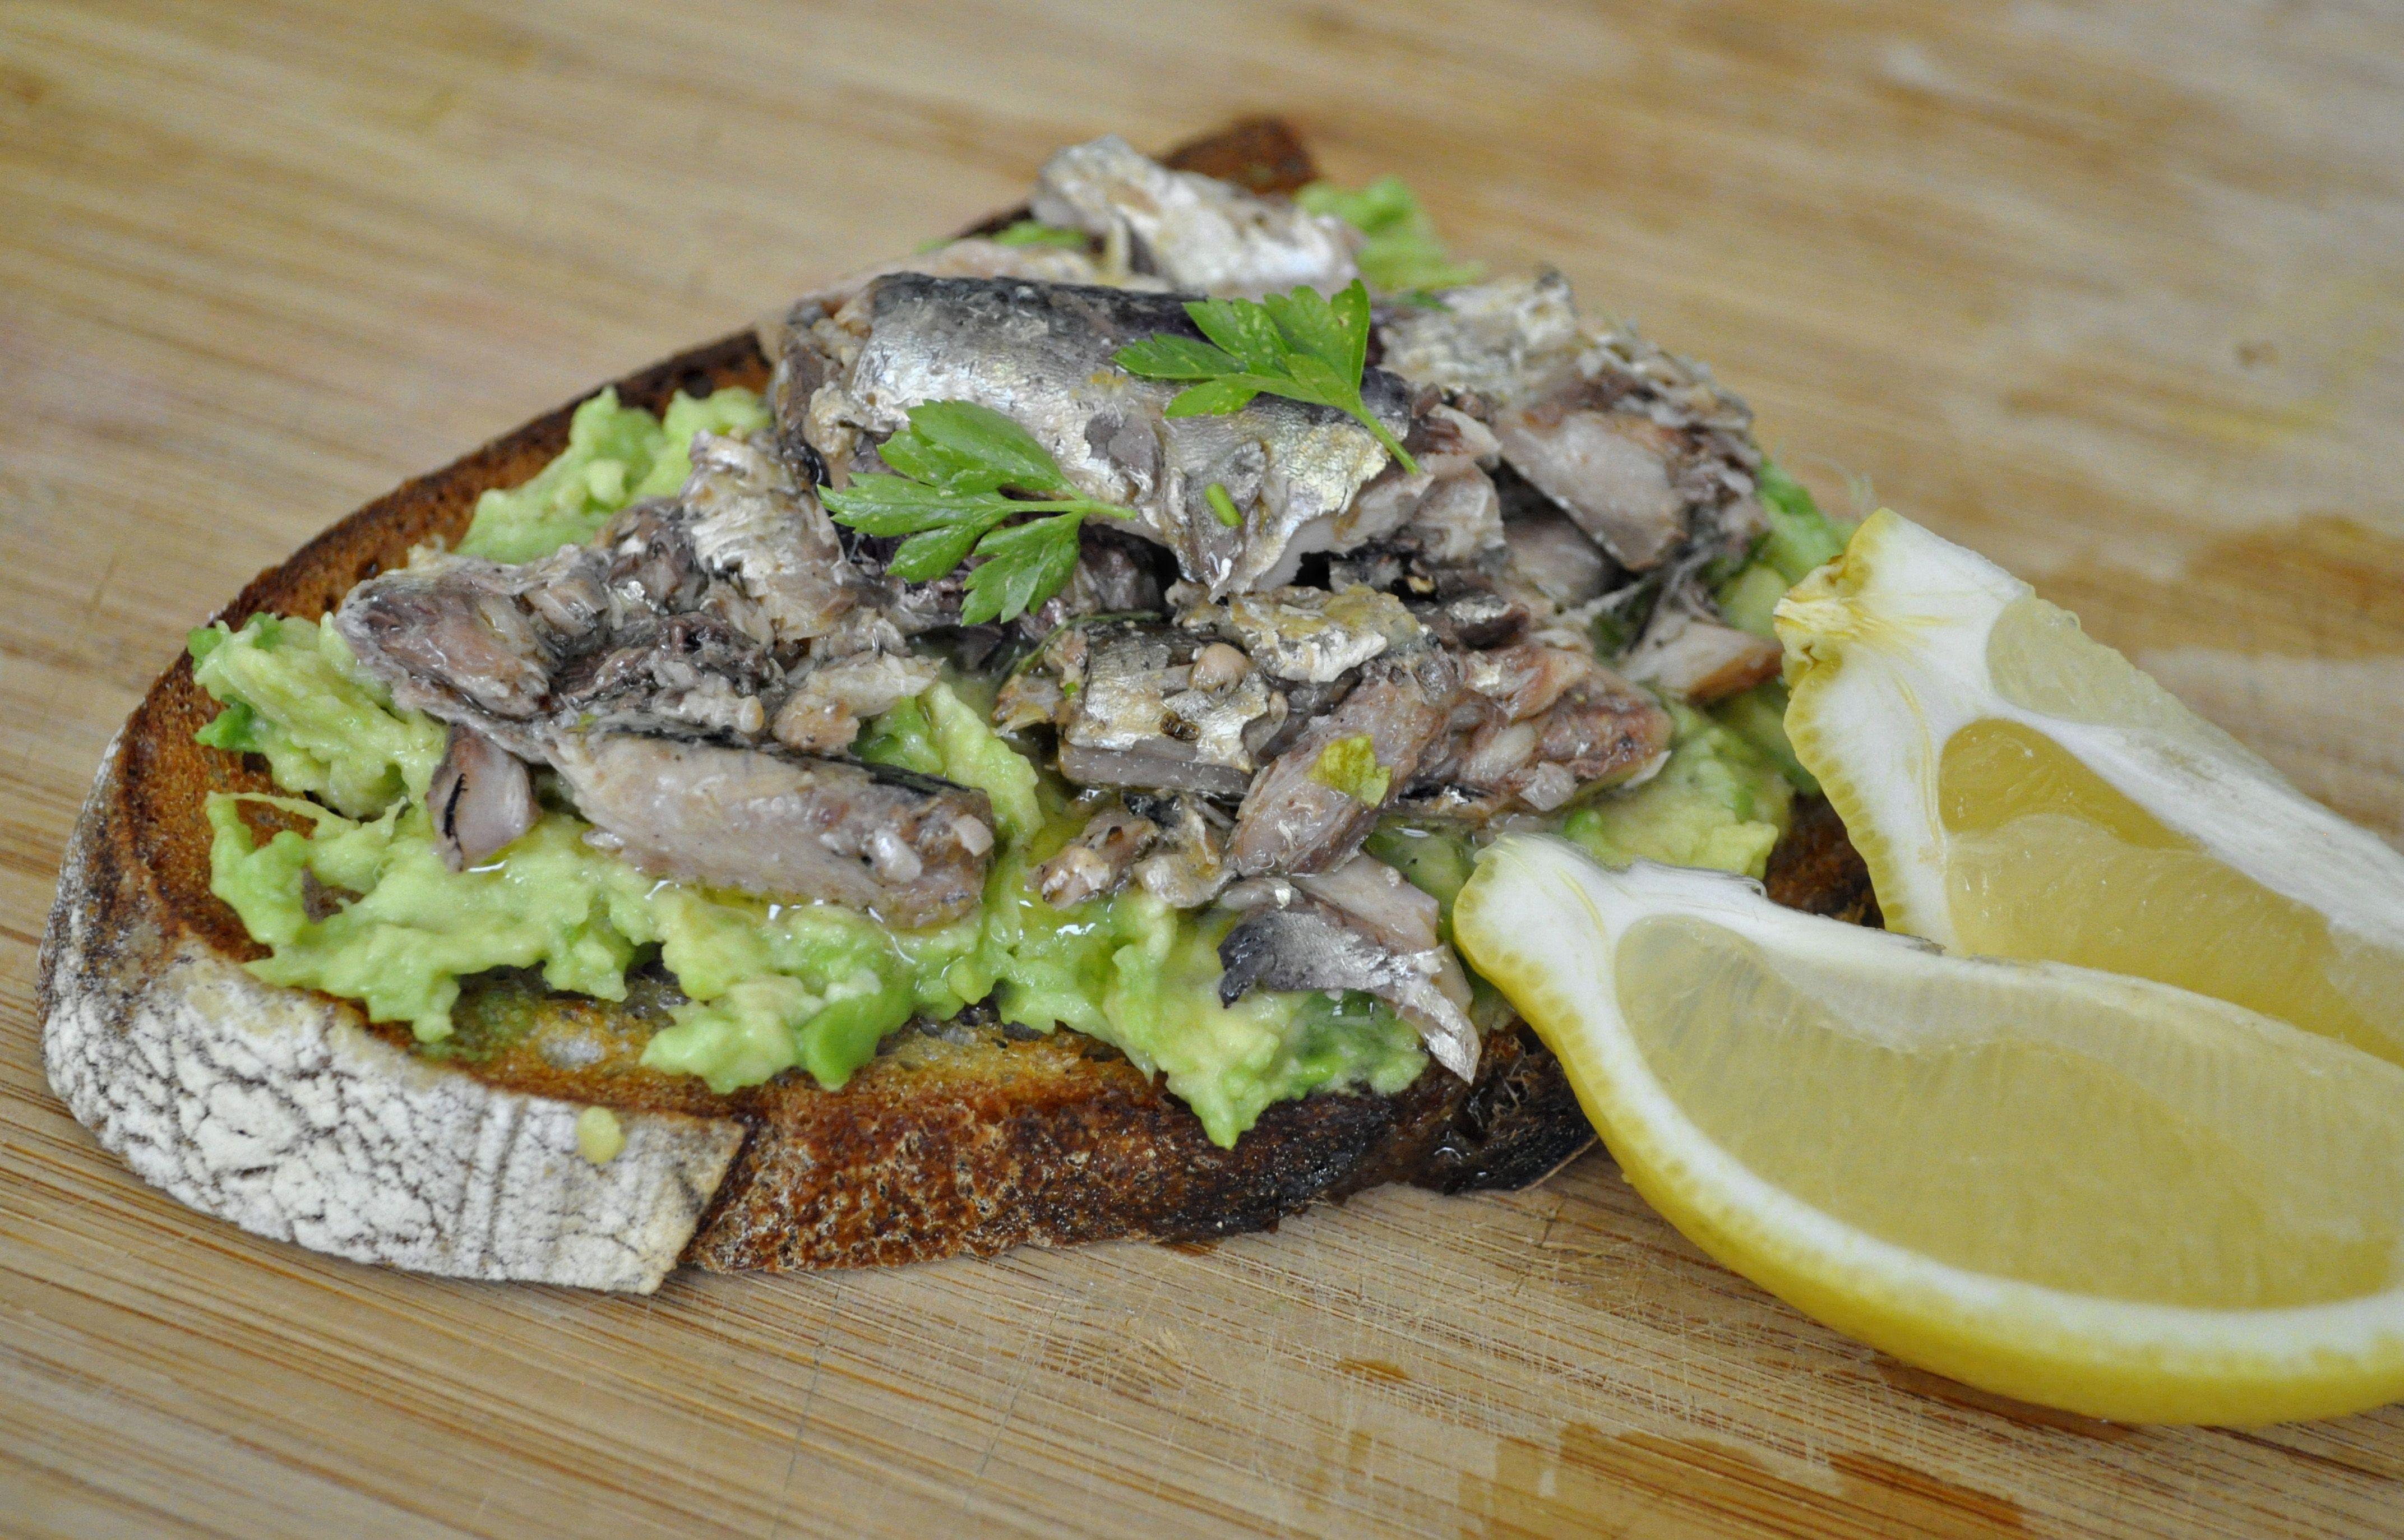 Alton brown 39 s sardine avocado sandwich recipes to try for Sardine lunch ideas